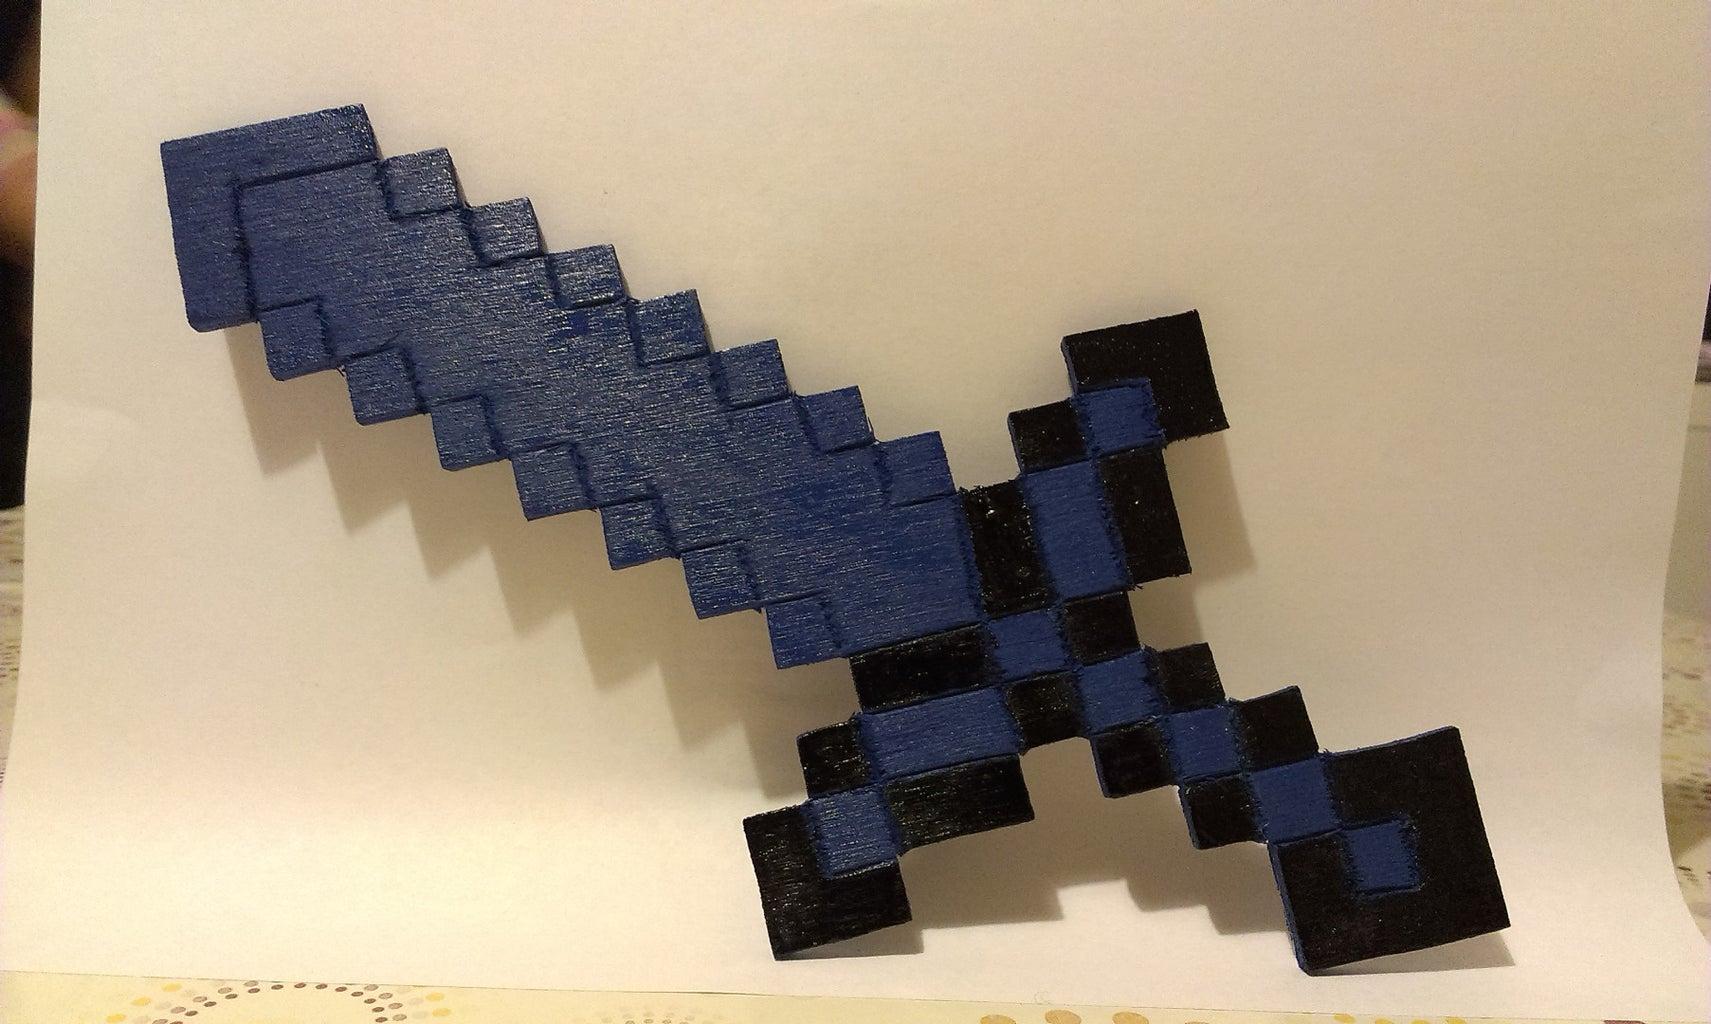 Minecraft Wooden Sword